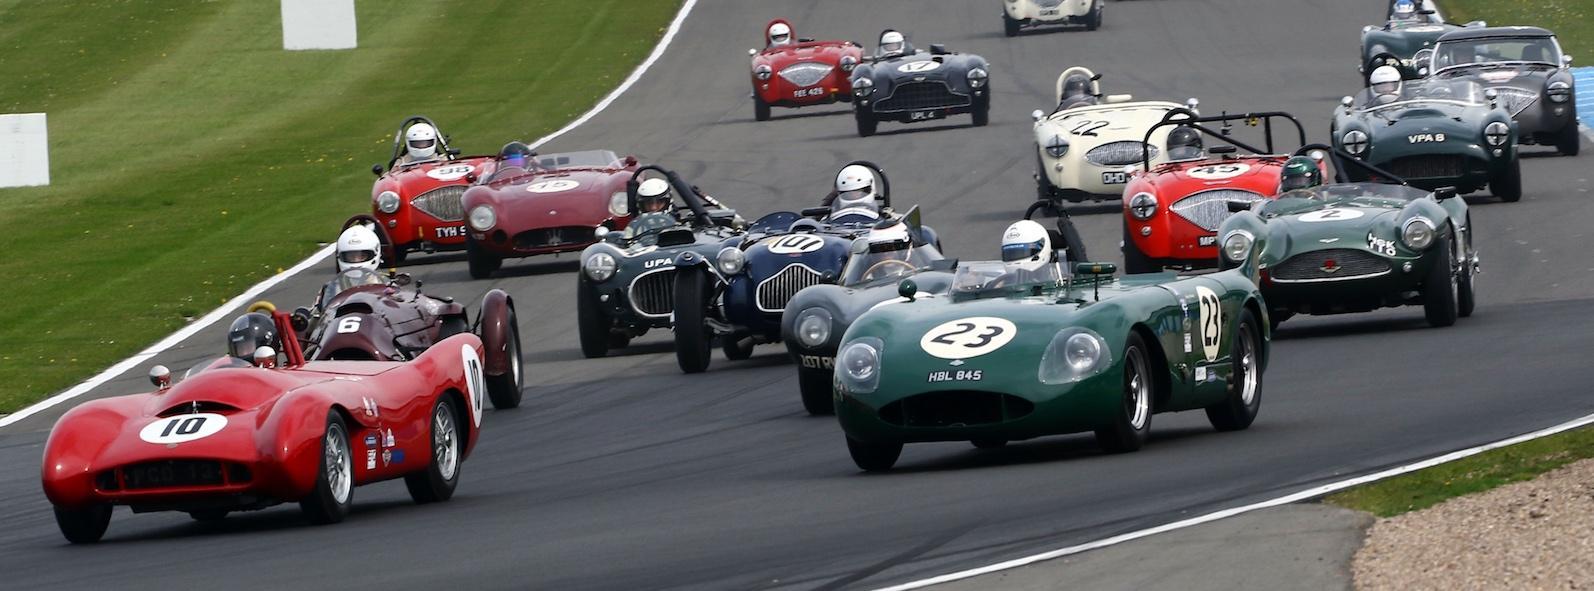 Donington Historic Festival race line-up announced